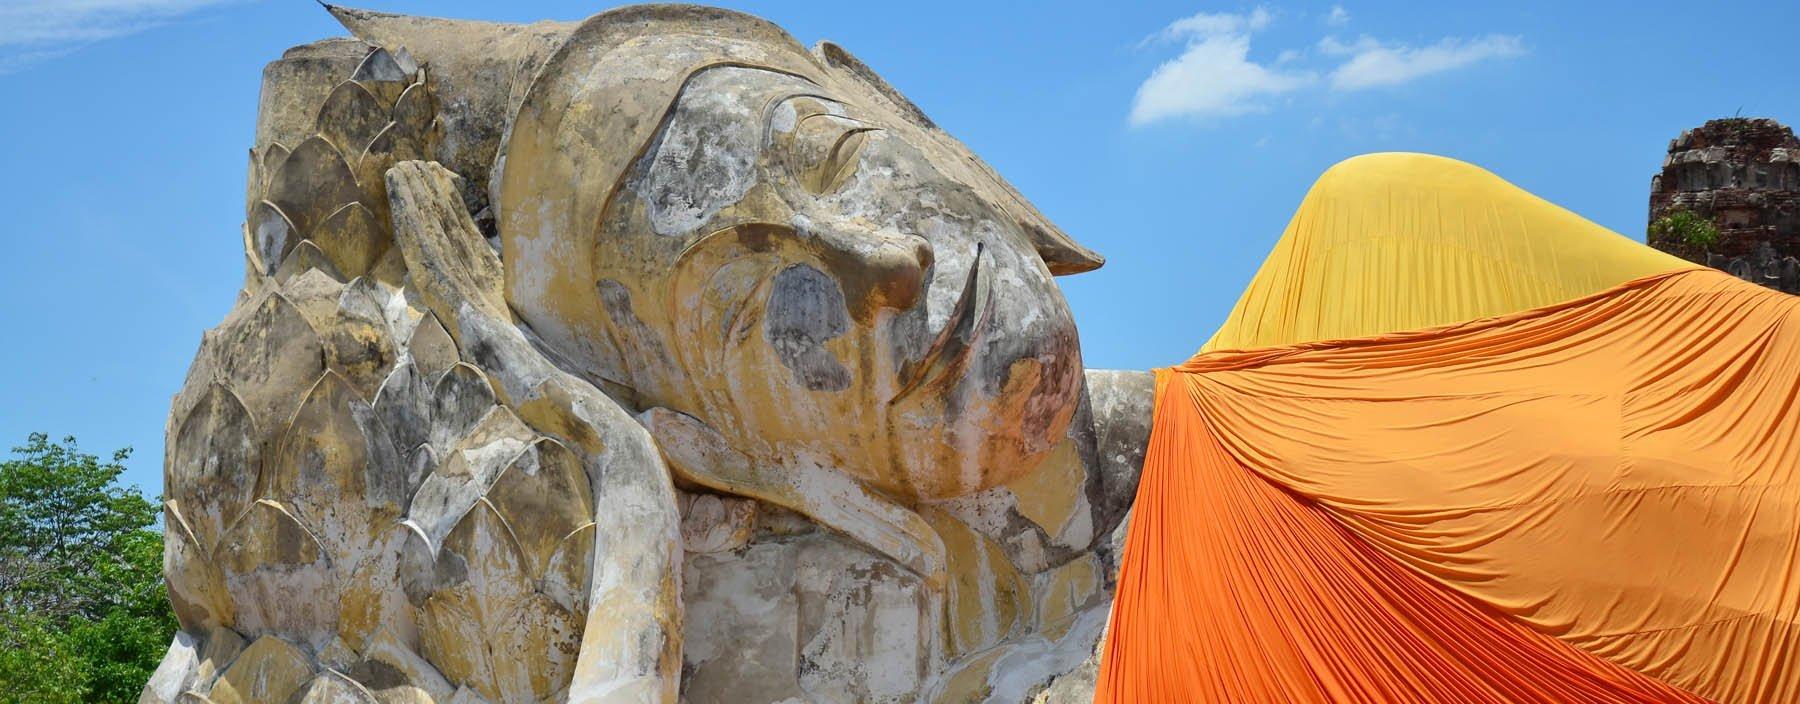 th, ayutthaya, temple of the reclining buddha (1).jpg